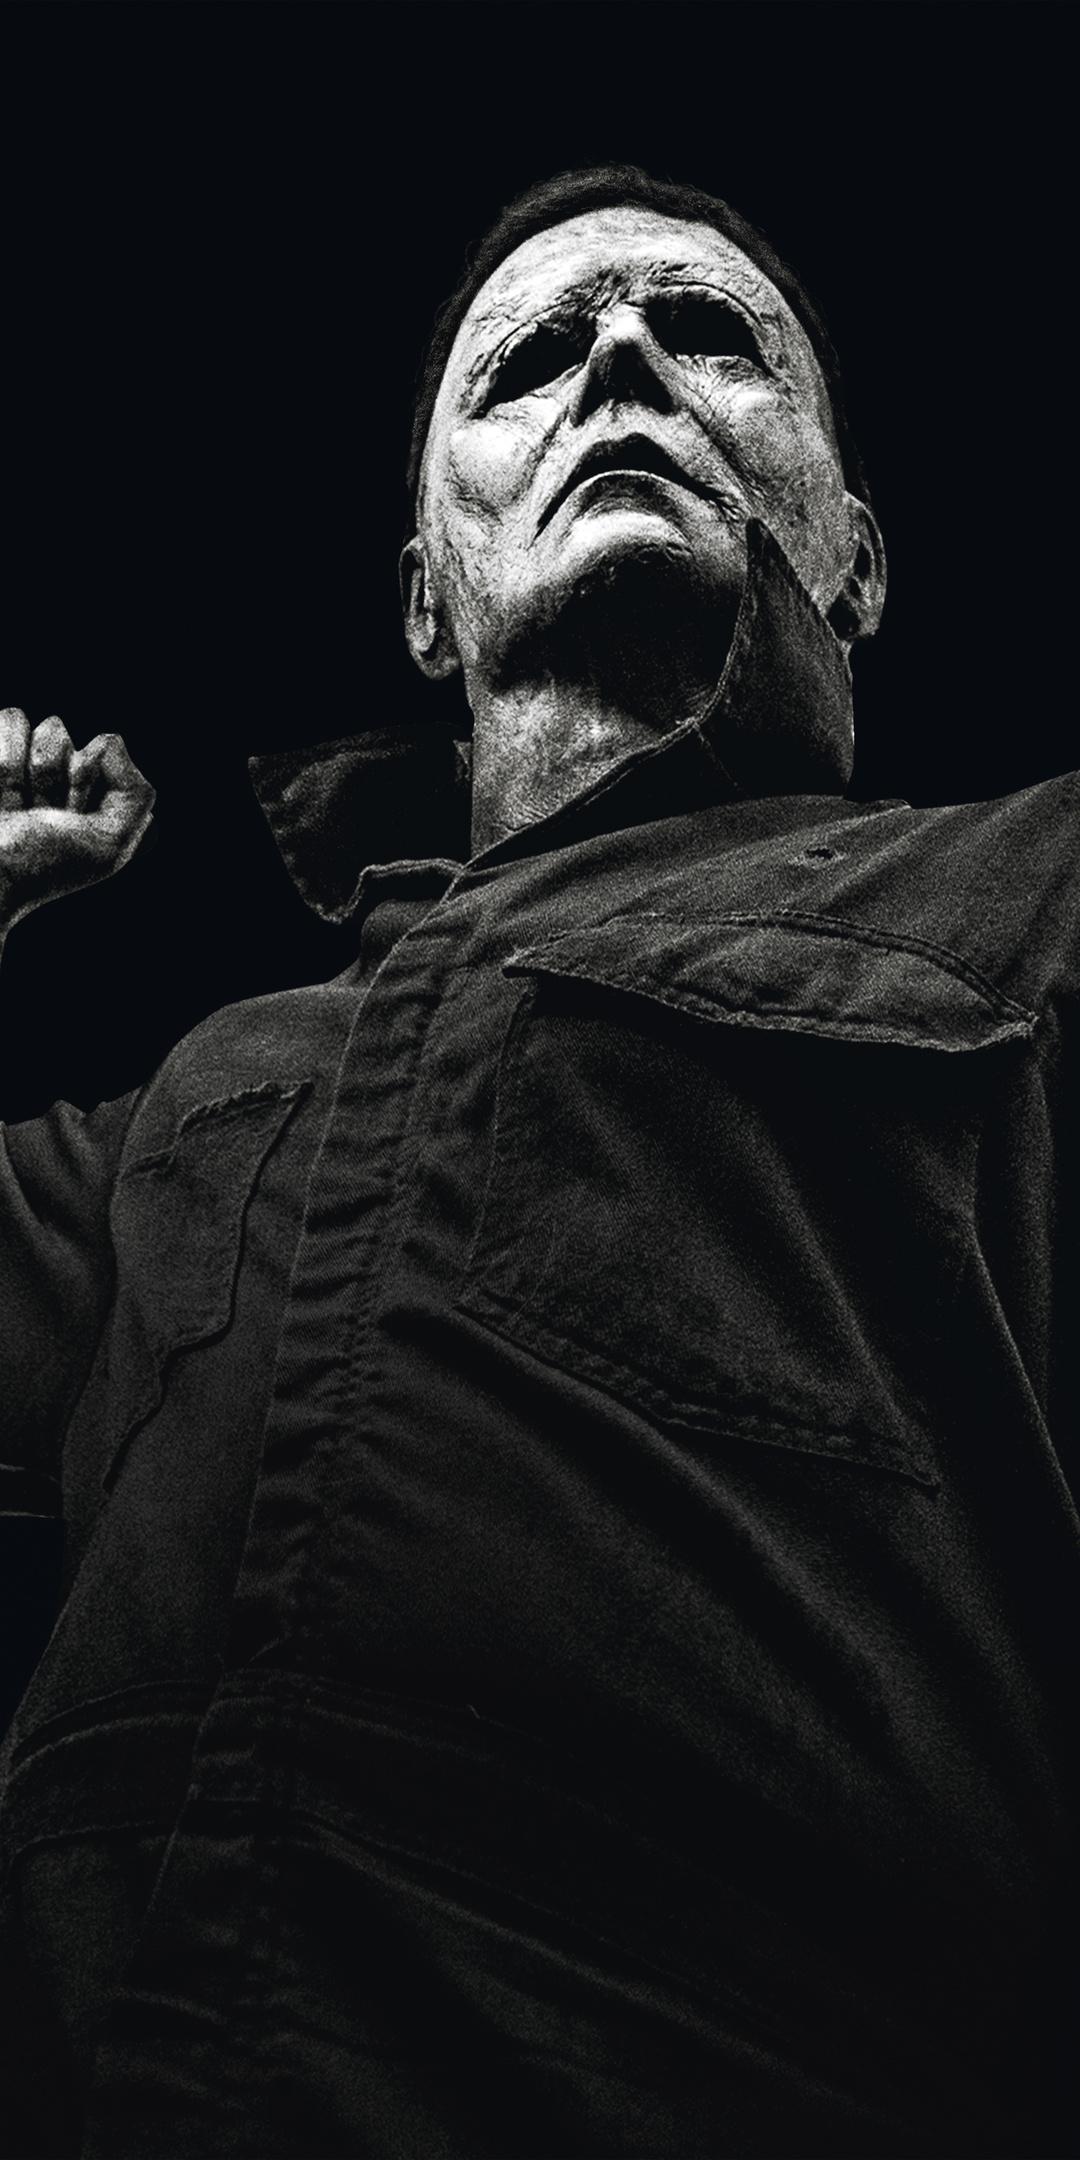 halloween-movie-12k-bn.jpg